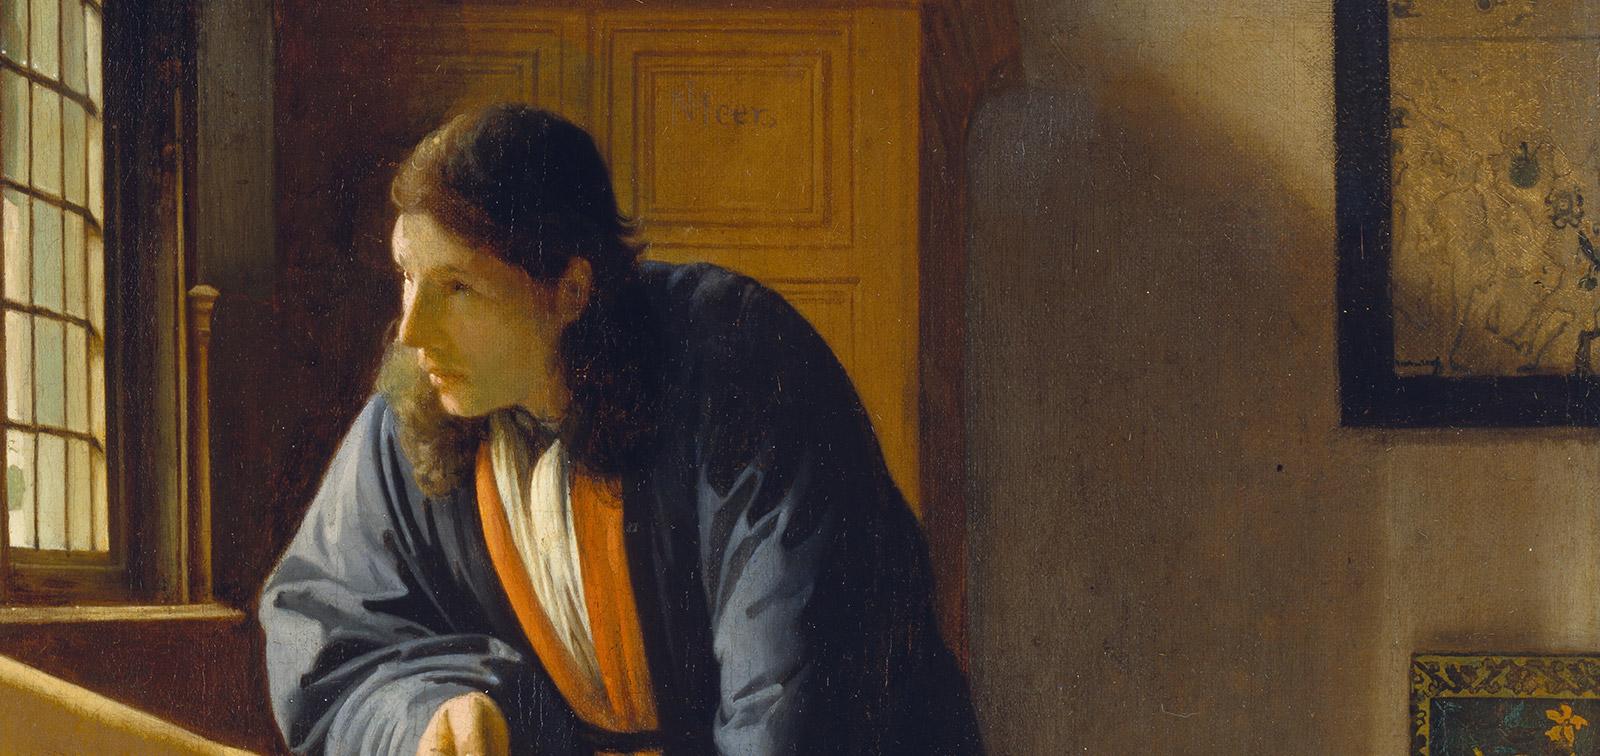 Exposición. Velázquez, Rembrandt, Vermeer. Parallel visions